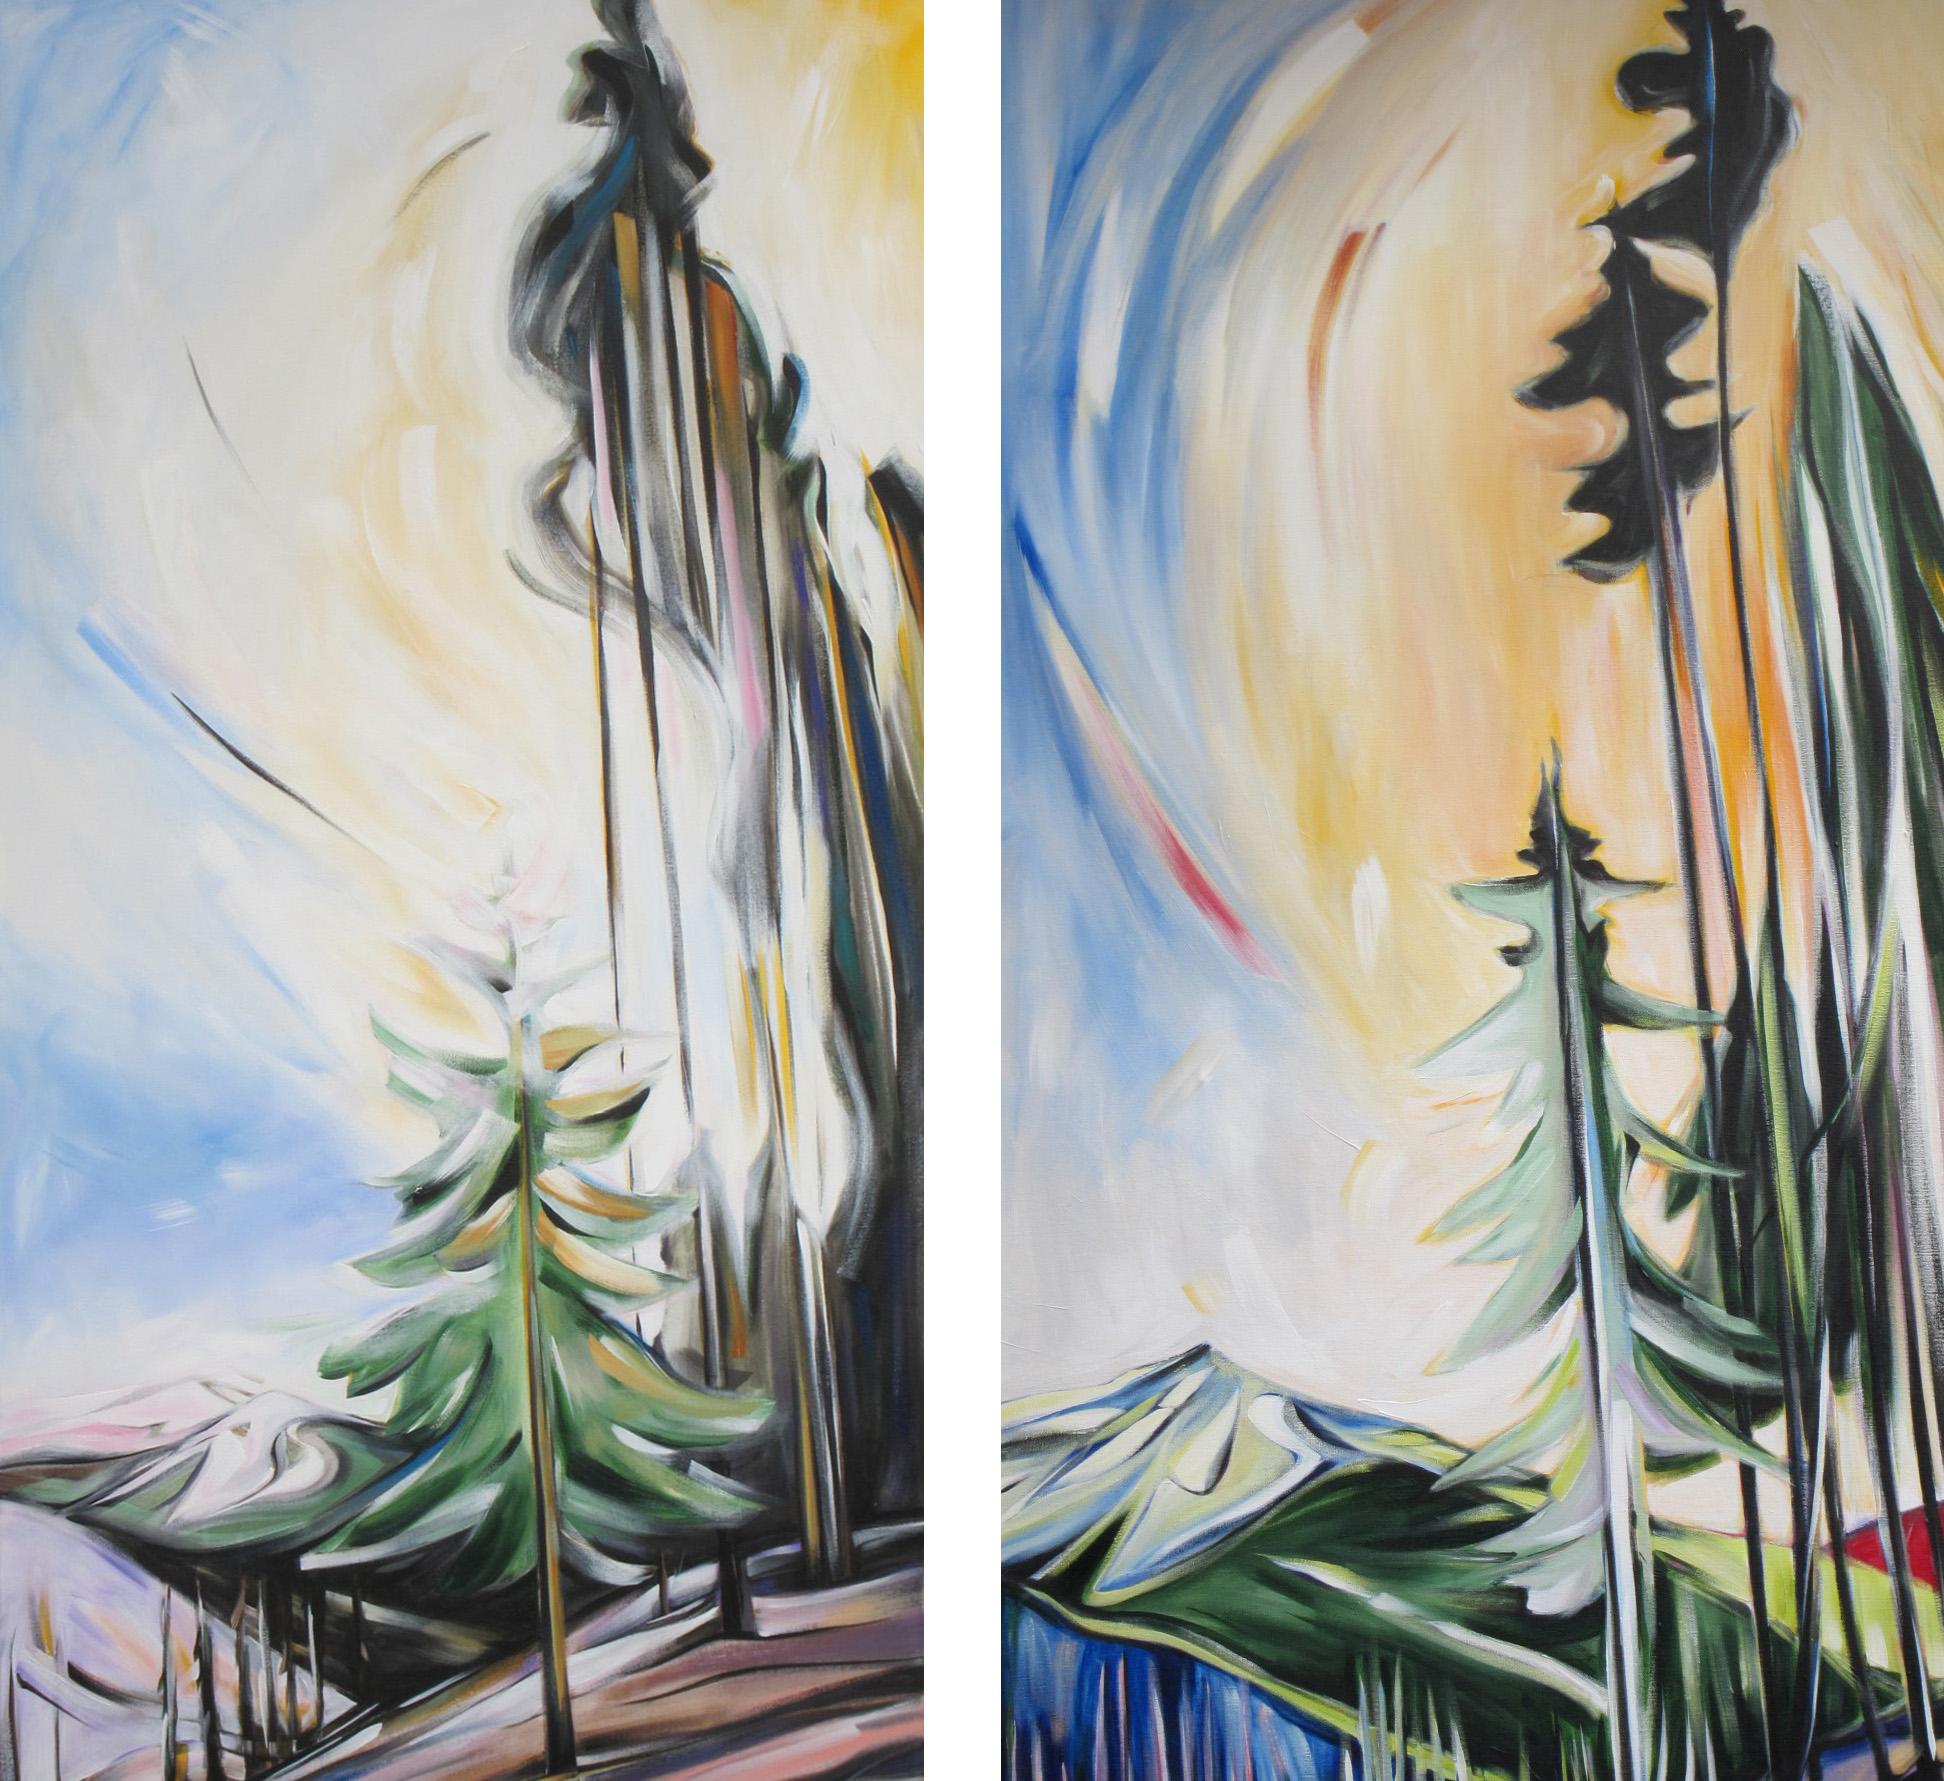 Veiled Skylight for Faure #1 & #2 (Panorama Series)